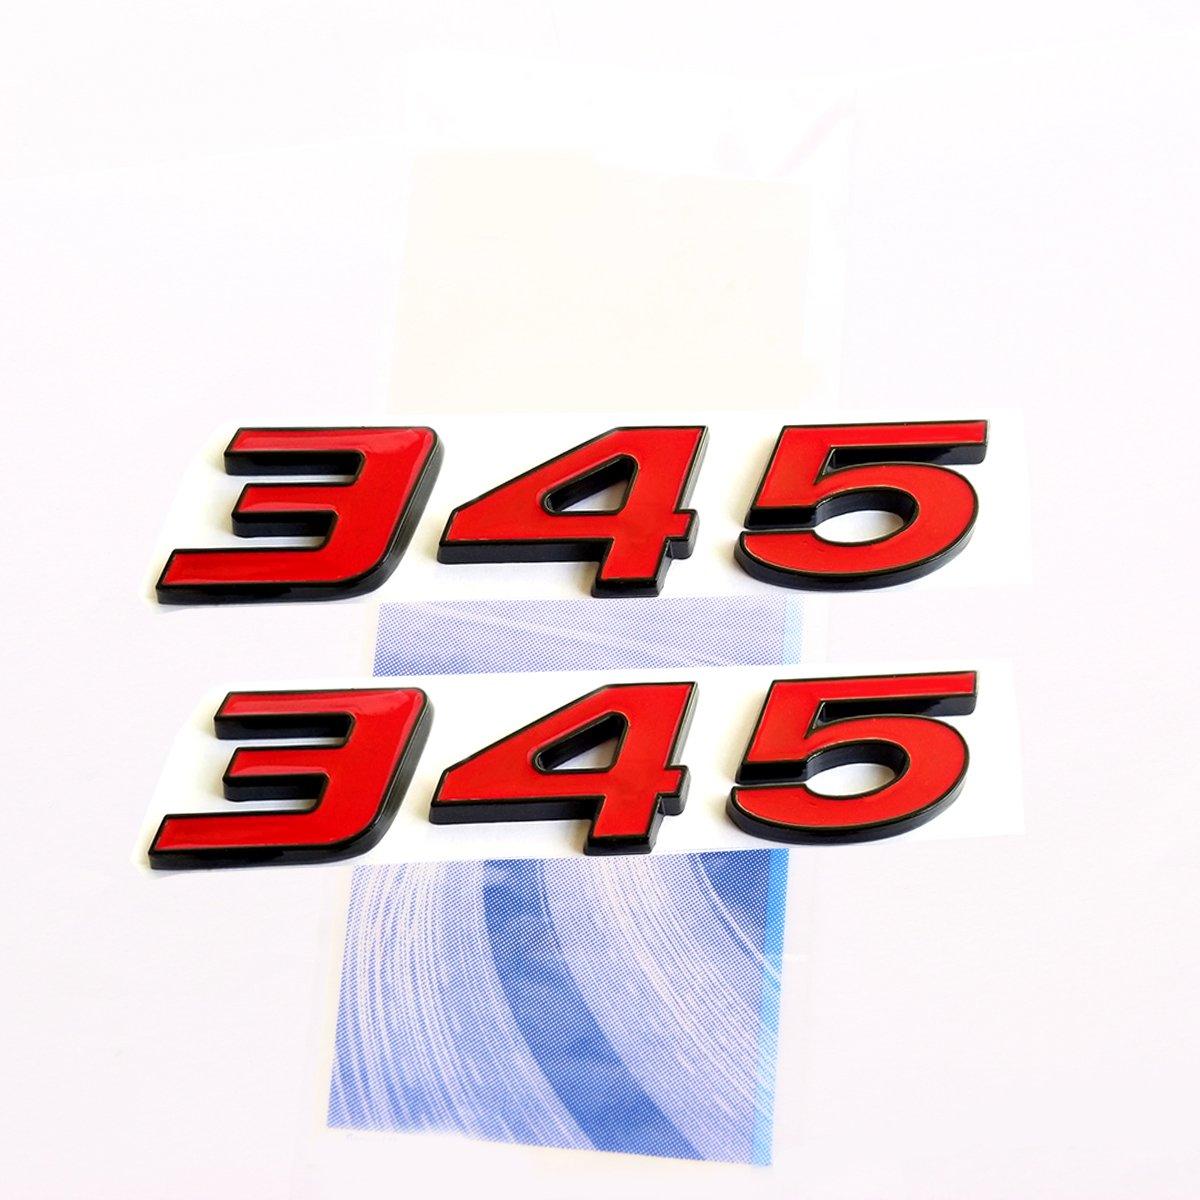 Yoaoo 2pcs OEM Black 345 Emblems Badge 3D for Challenger RAM 345 L1 Red